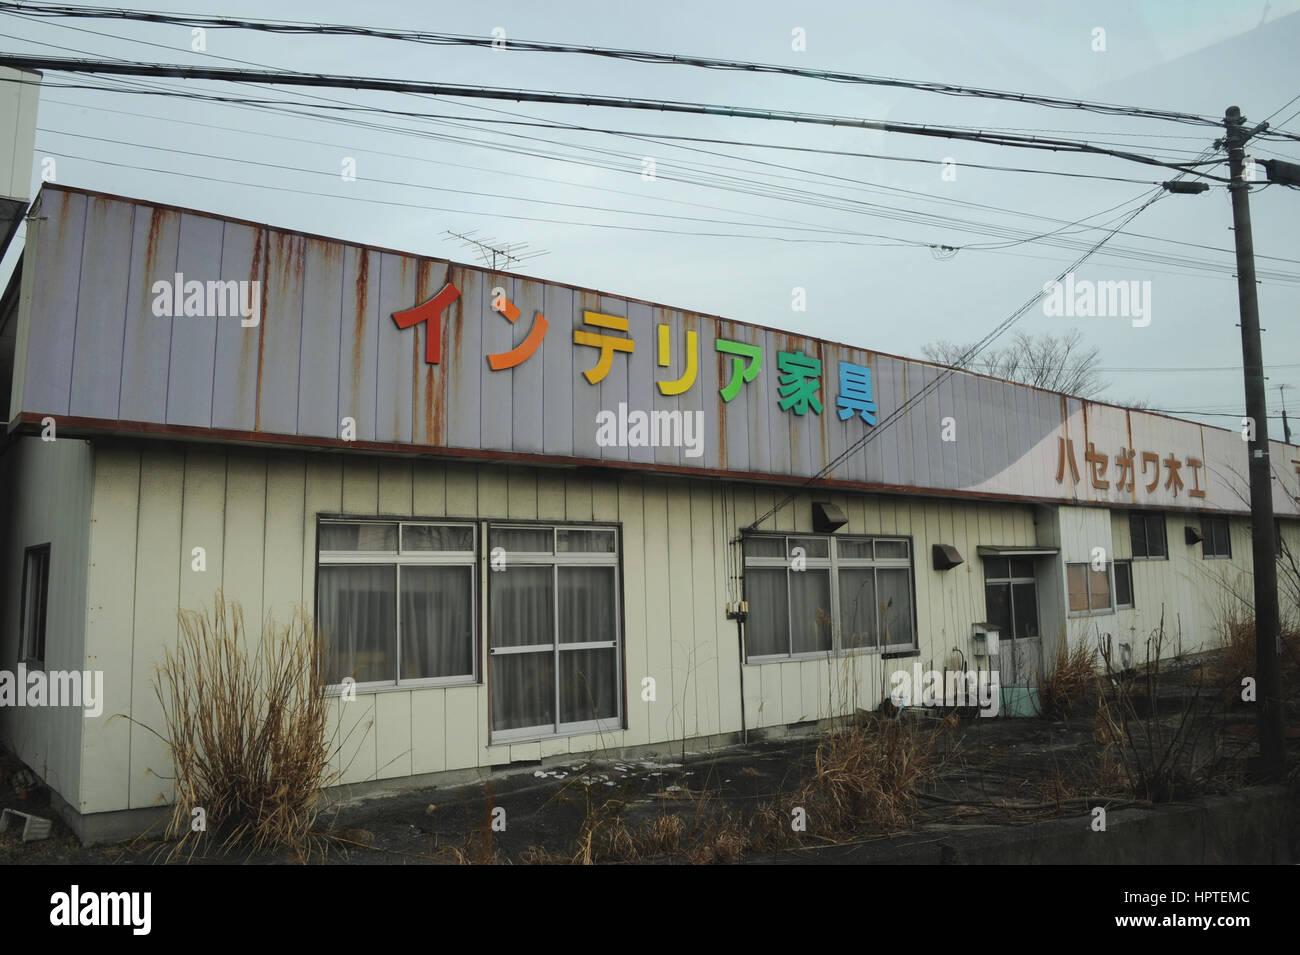 (170225) -- FUKUSHIMA(JAPAN), Feb. 25, 2017 (Xinhua) -- Photo taken on Feb. 22, 2017 shows an abandoned building - Stock Image